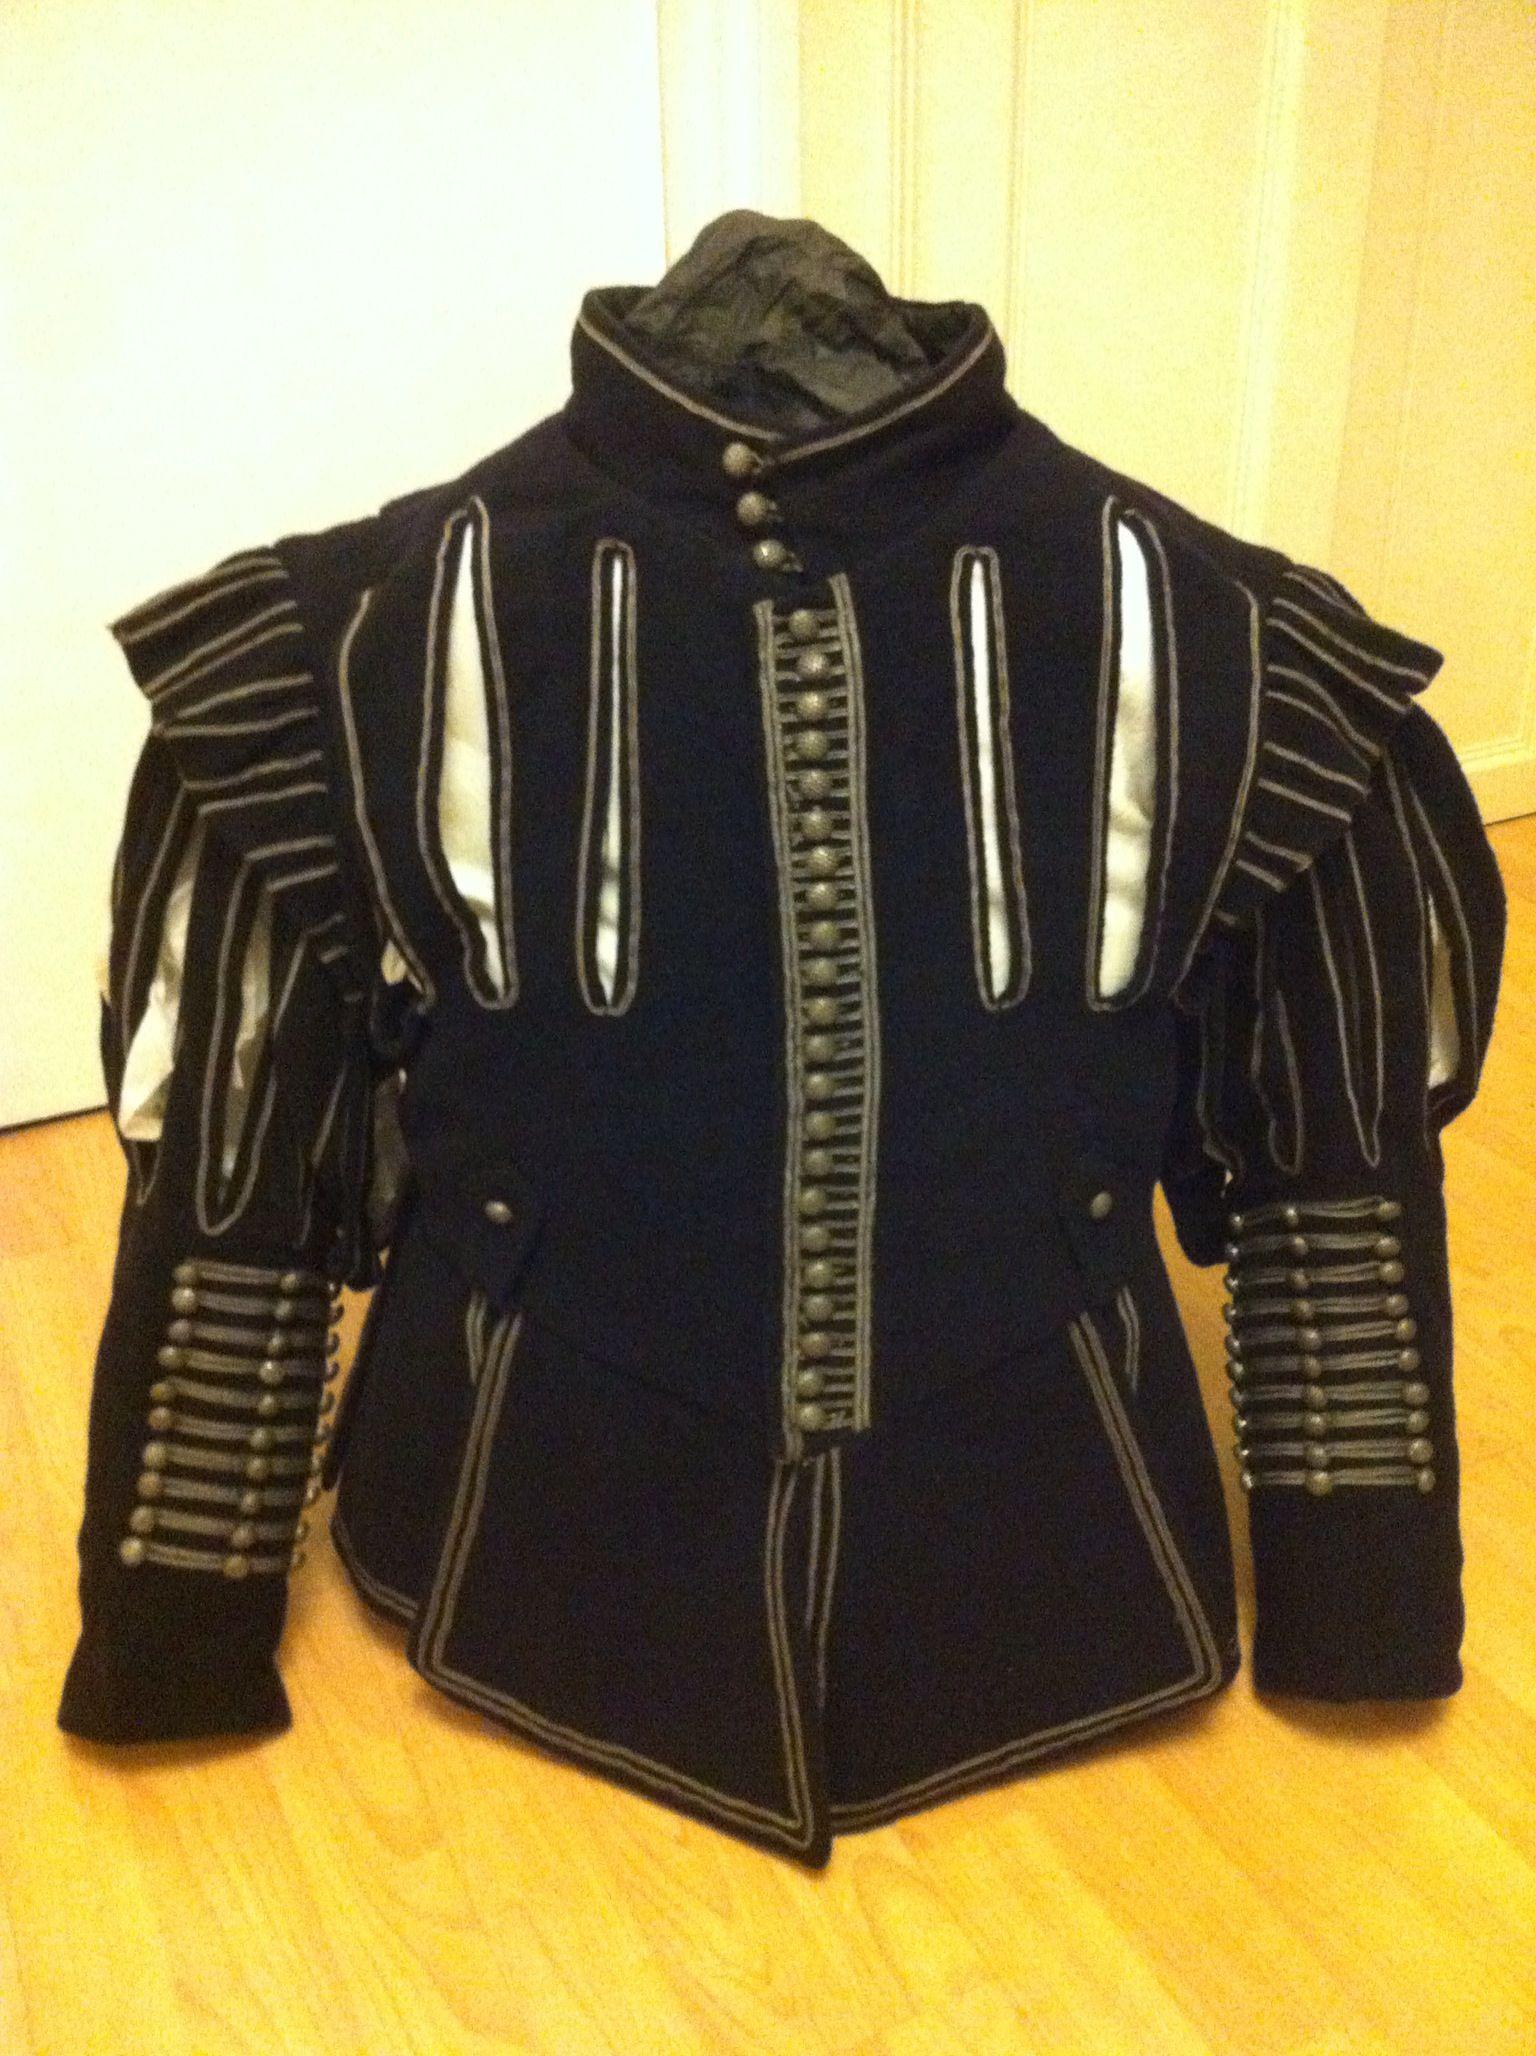 Replica doublet 1630's style, based on surviving doublets. Midnight blue wool, black silk, grey silk braid.